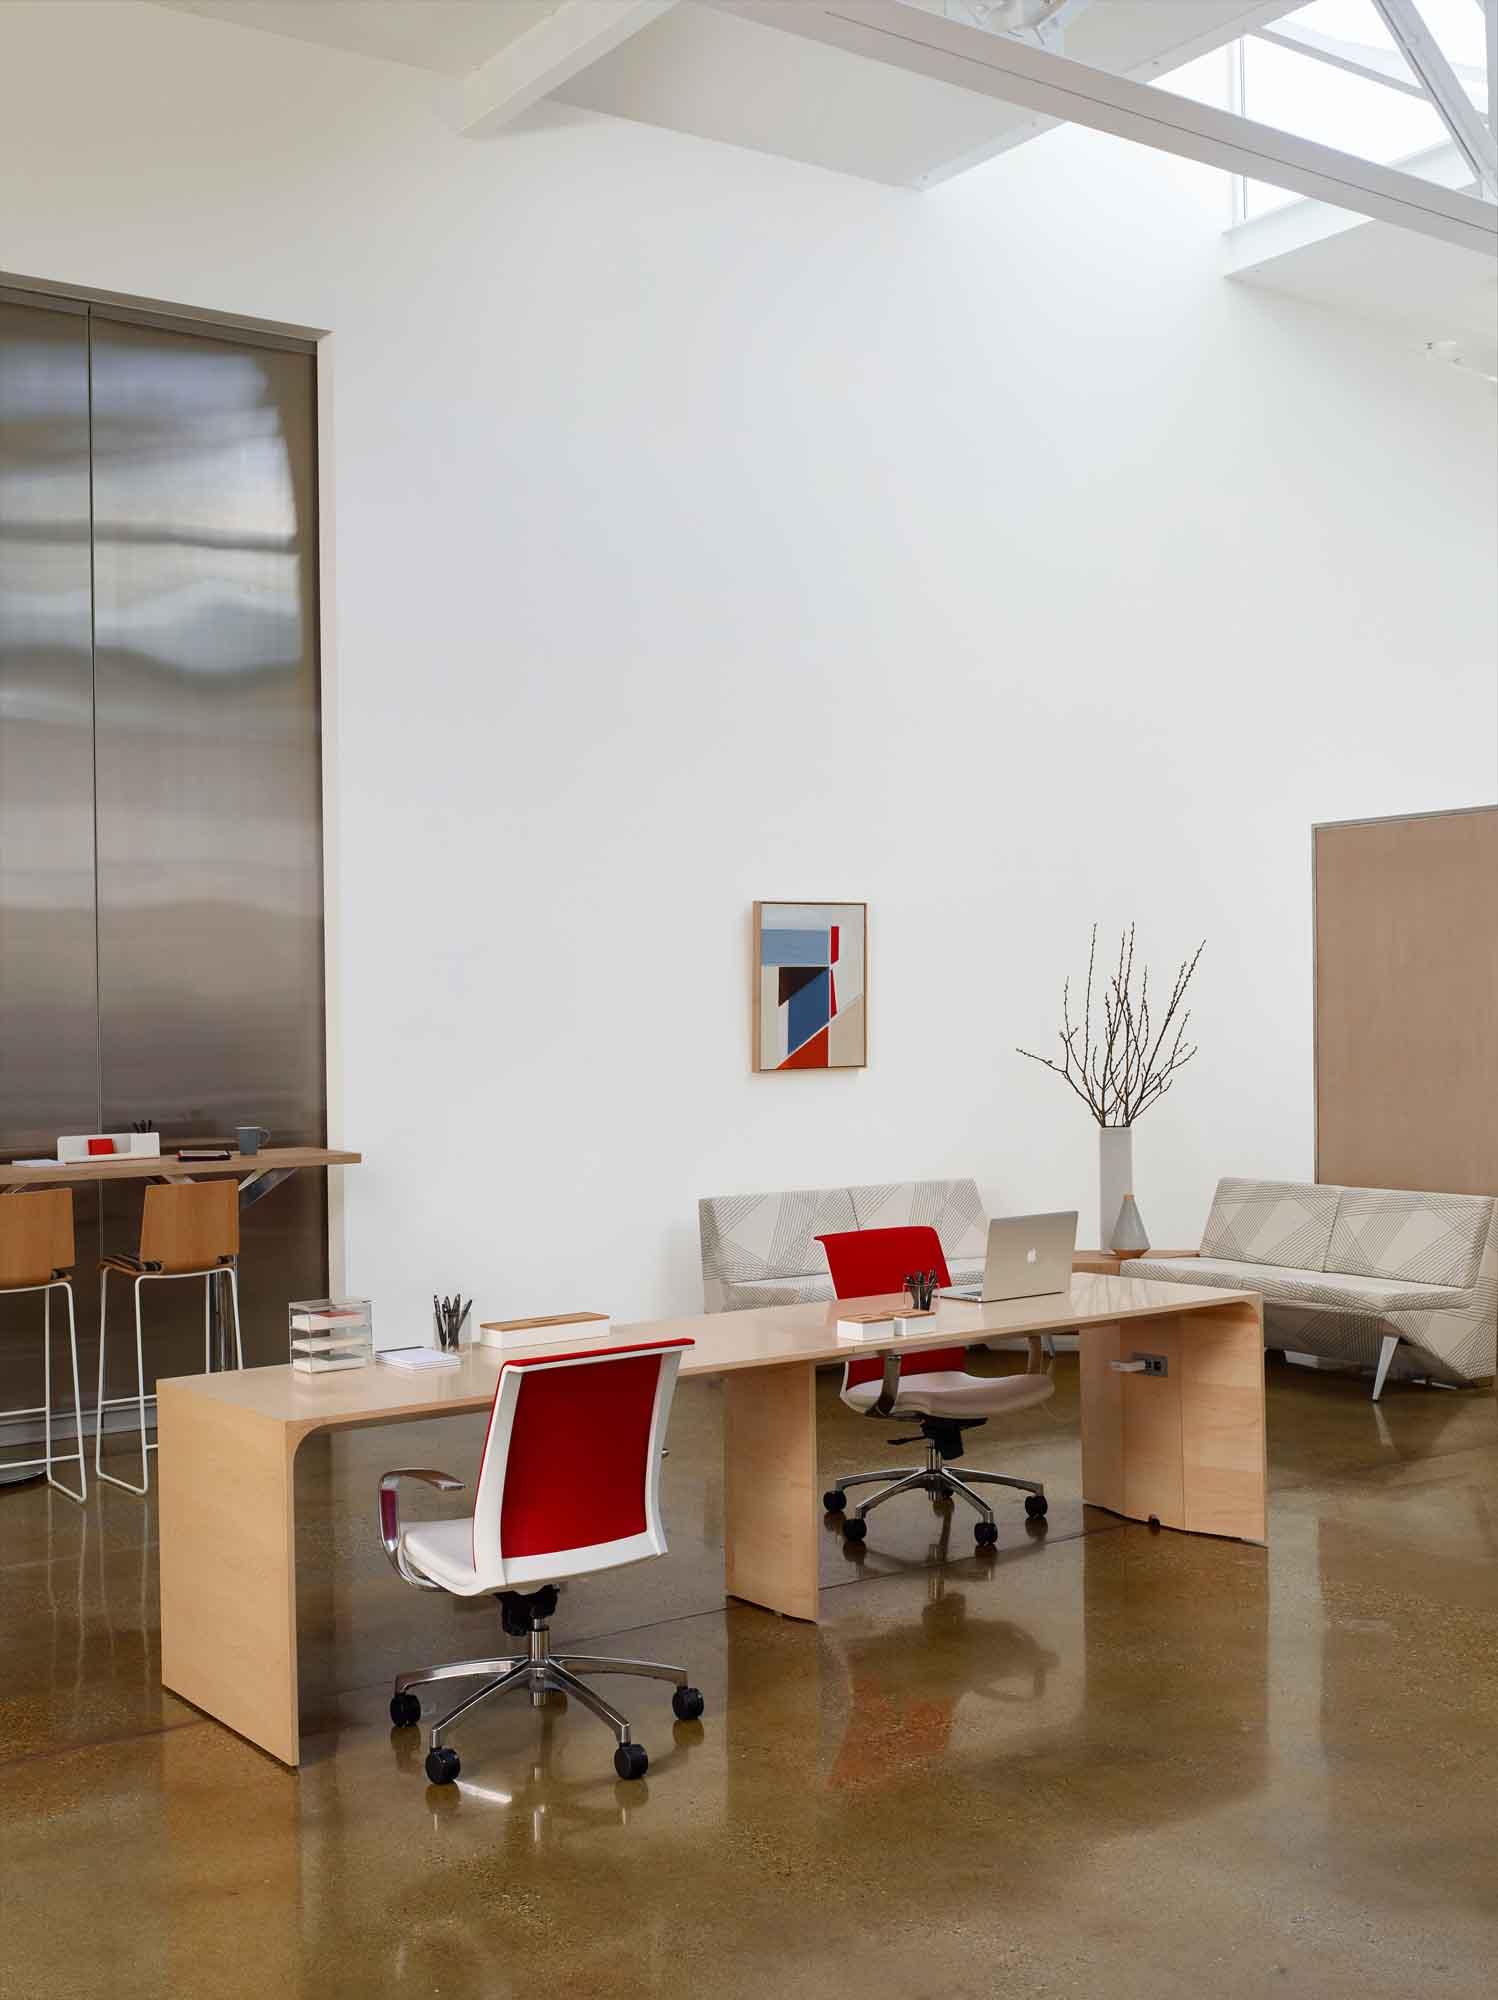 Avelina-29-Inch-Height-Table-Pinnacle-Task-Chairs1.jpg